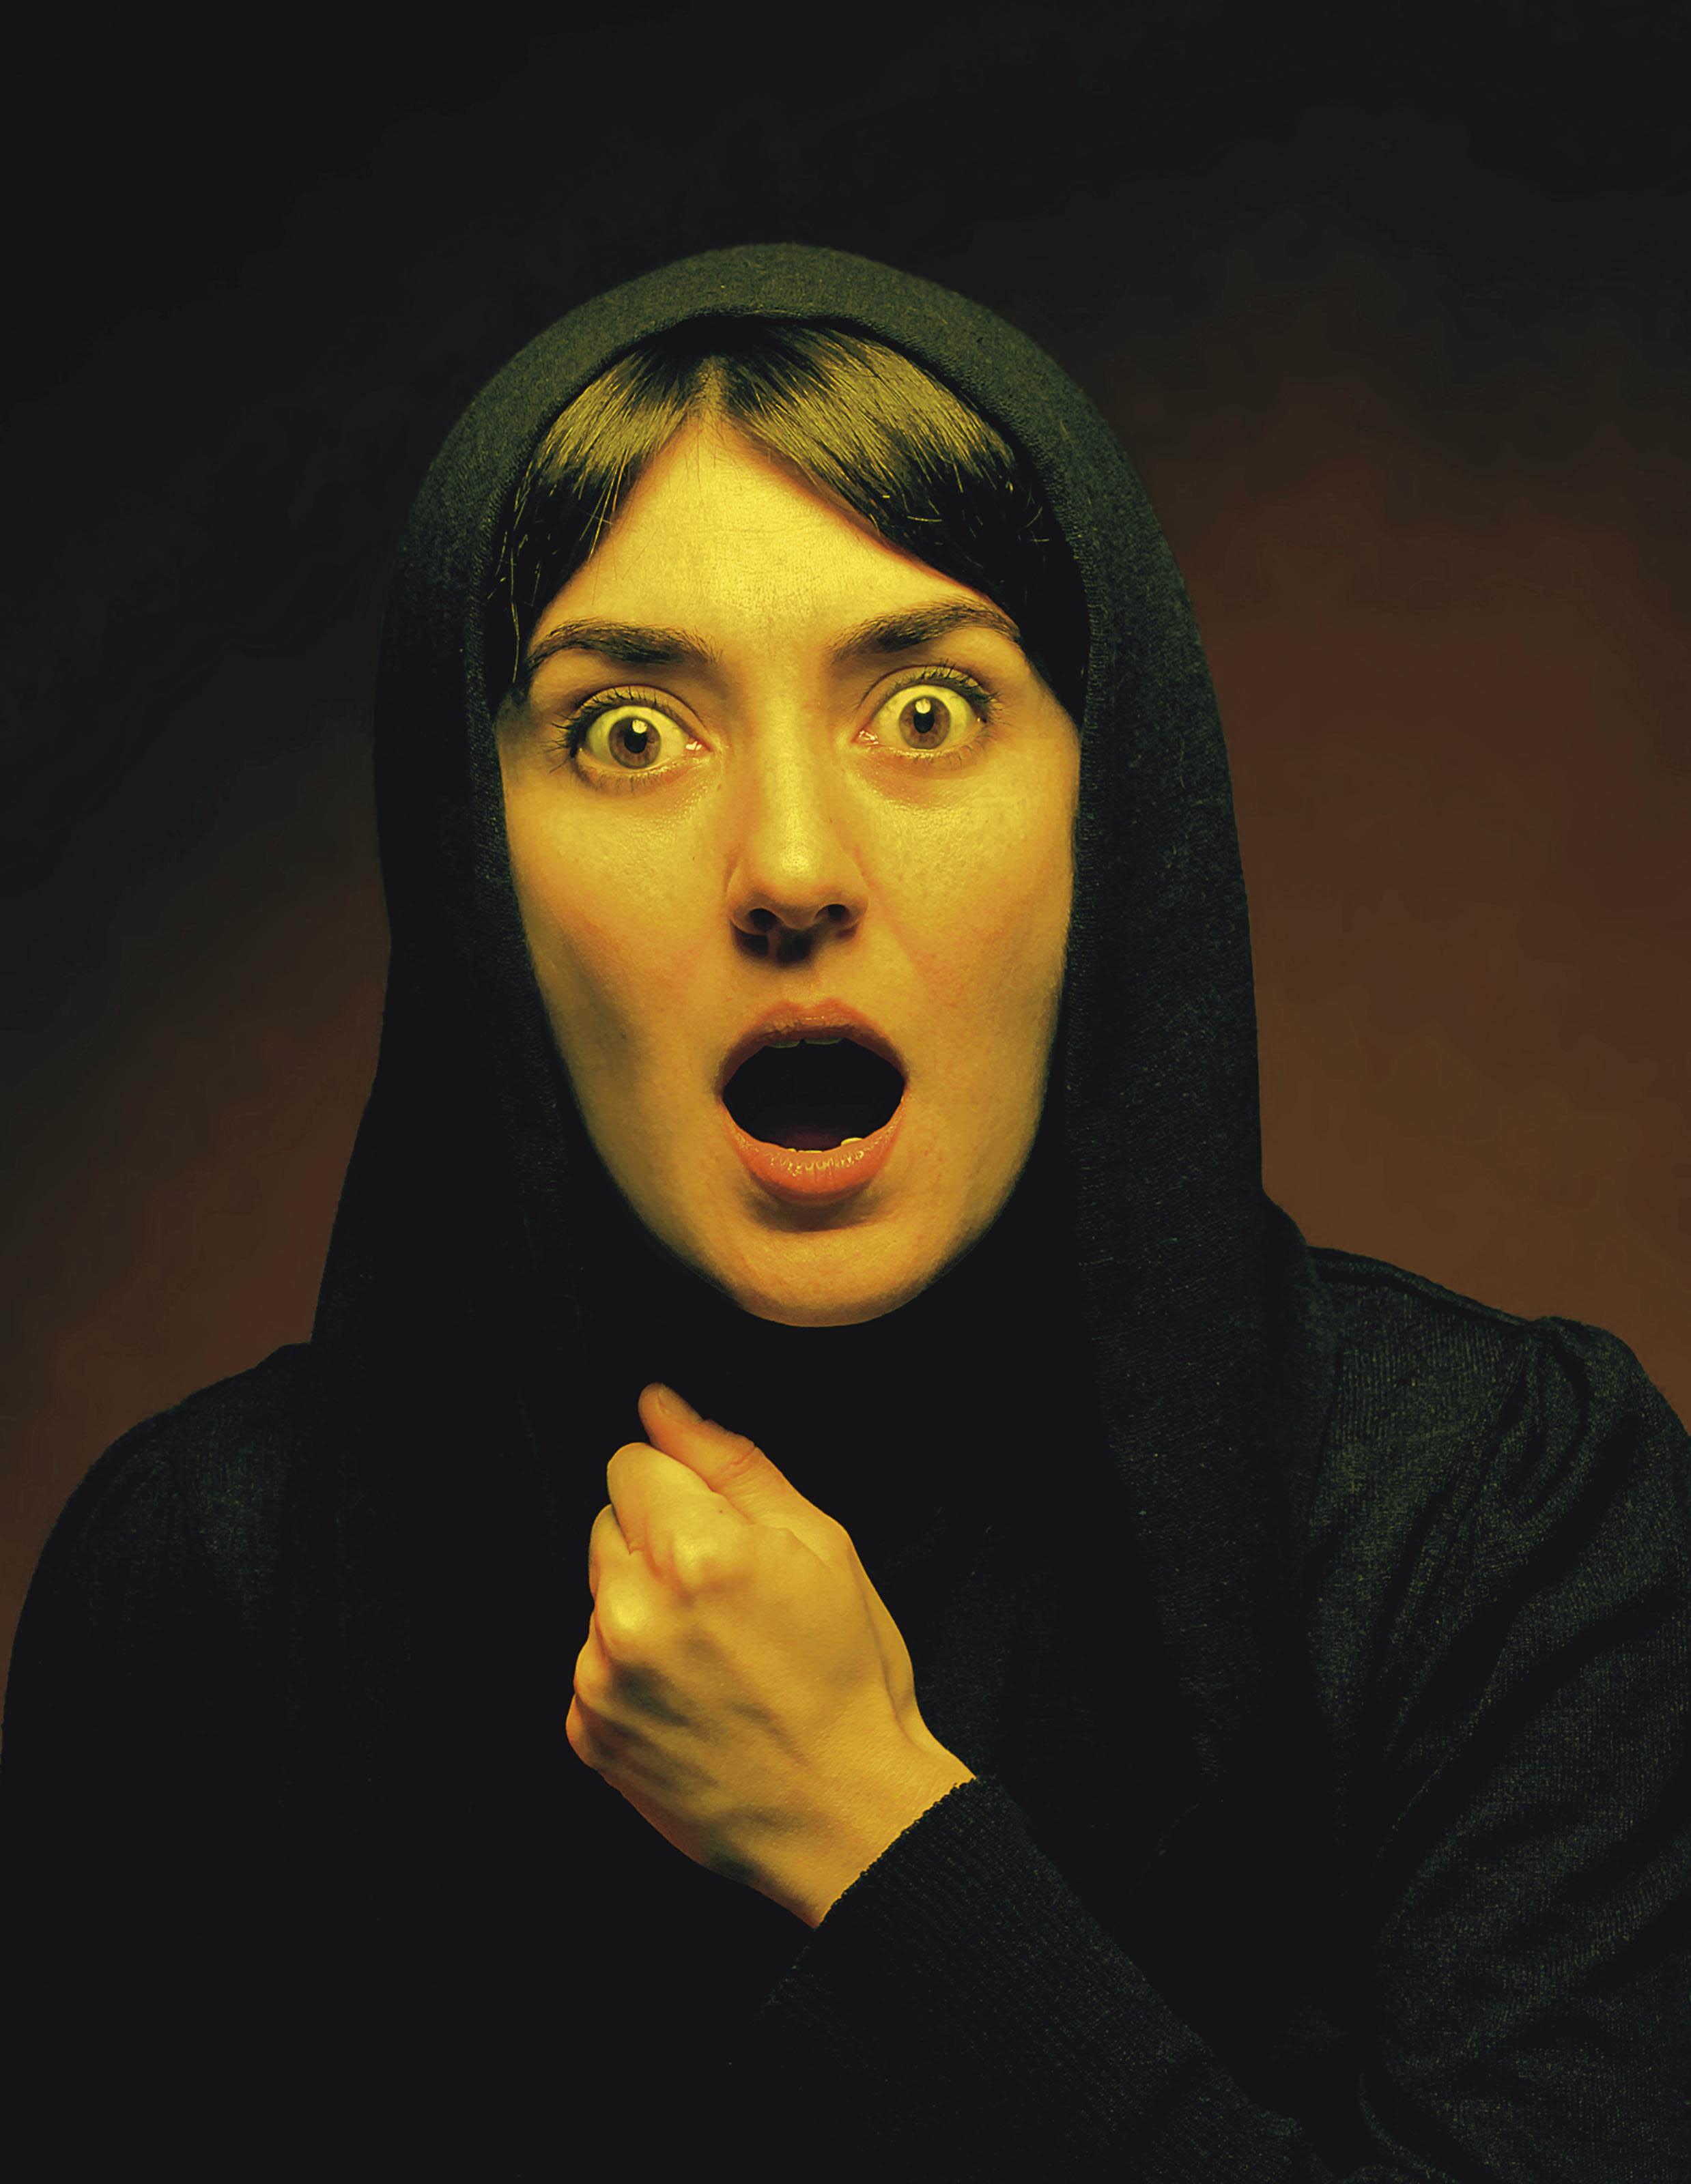 Self-portrait as Screaming Lady (After Nuri Iyem)